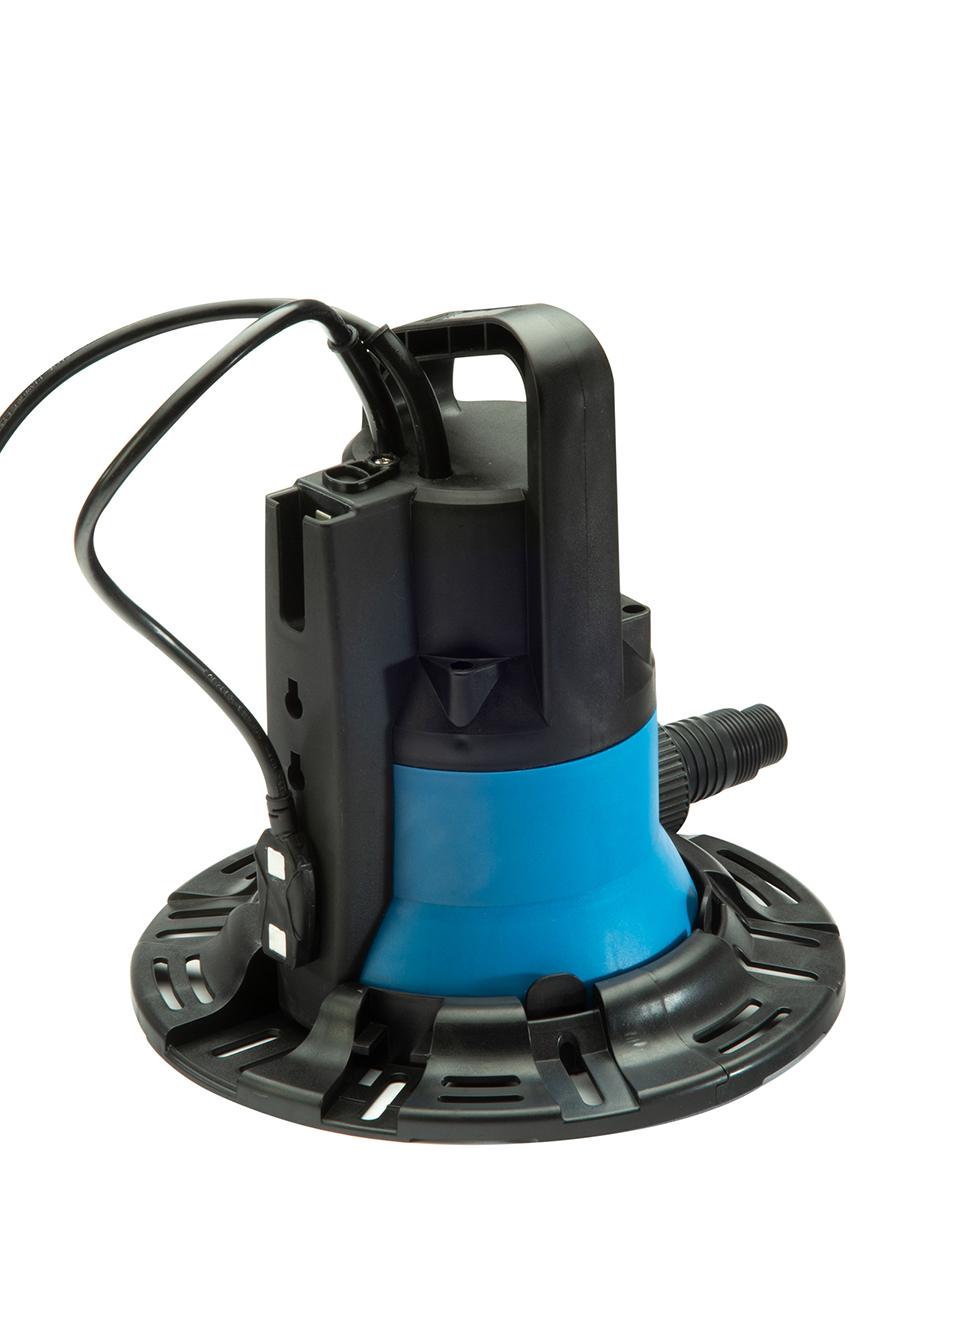 Ocean Blue Submersible Pump